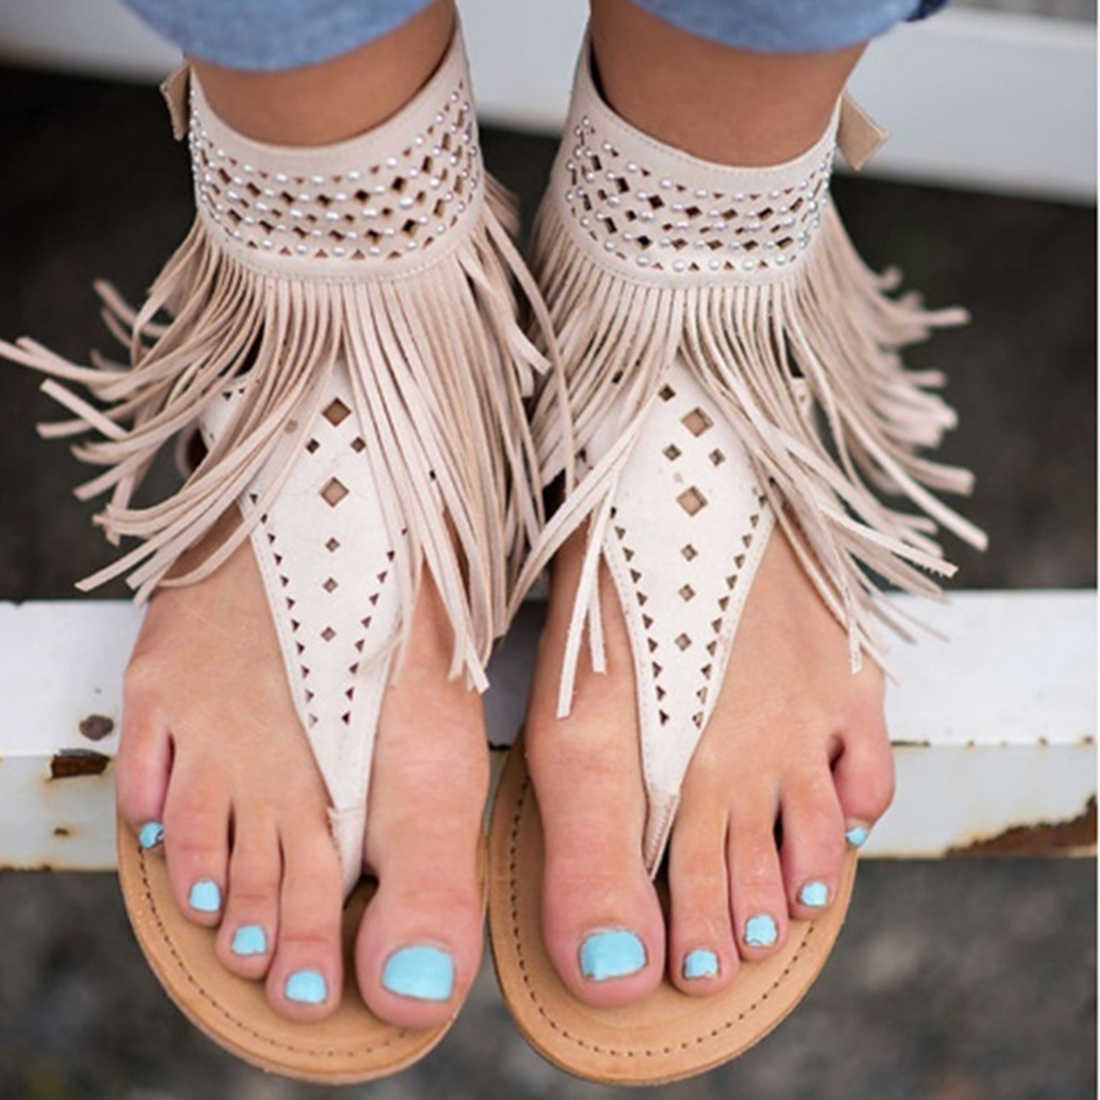 dec66299528c Women Sandals Fashion Tassel Summer Shoes Women 2018 New Flat Sandals  Female Flip Flops Casual Sandale